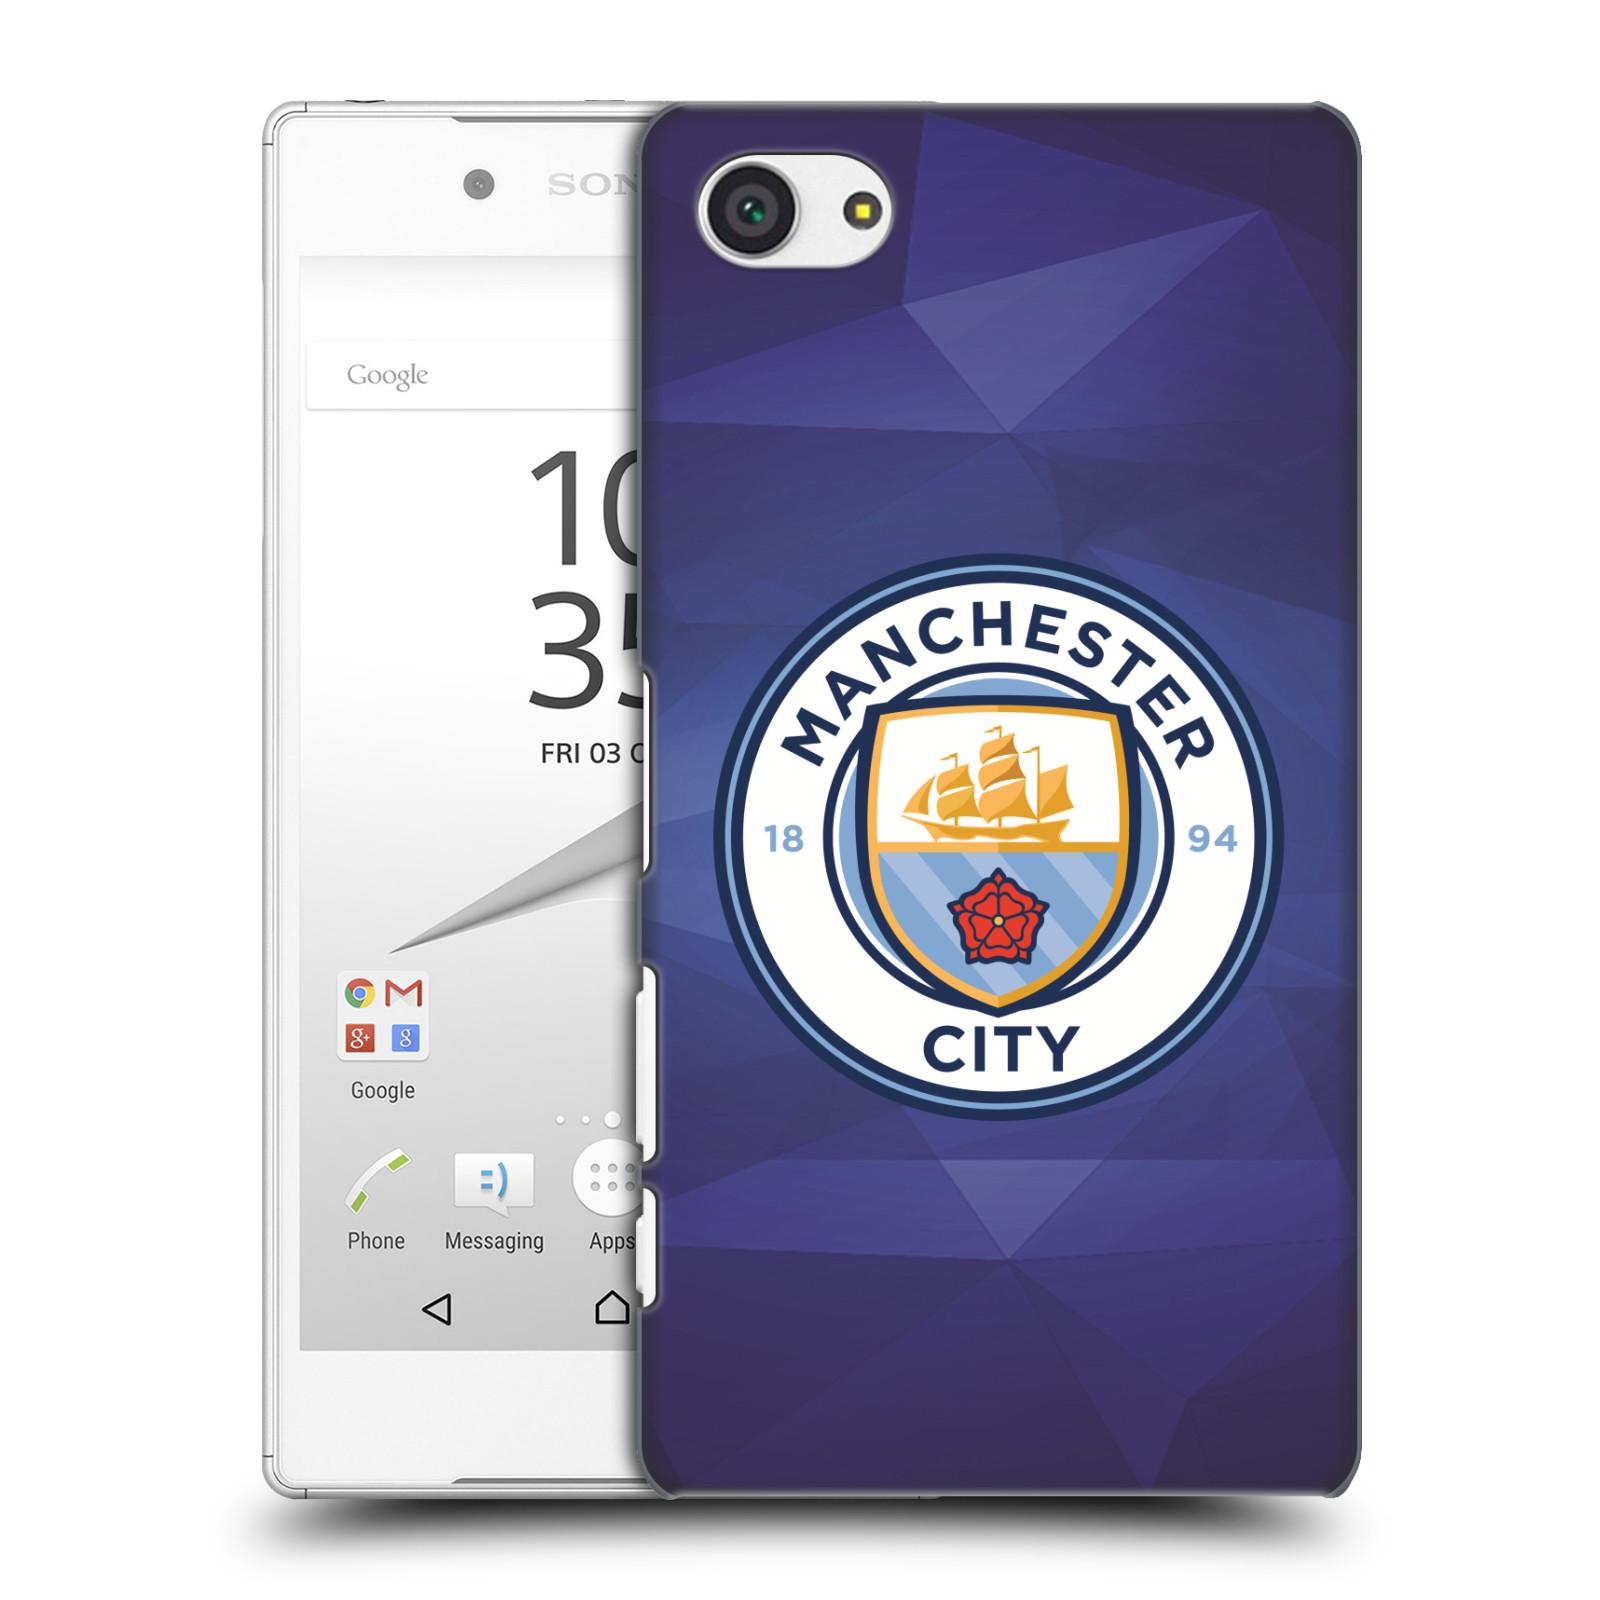 Plastové pouzdro na mobil Sony Xperia Z5 Compact HEAD CASE Manchester City FC - Modré nové logo